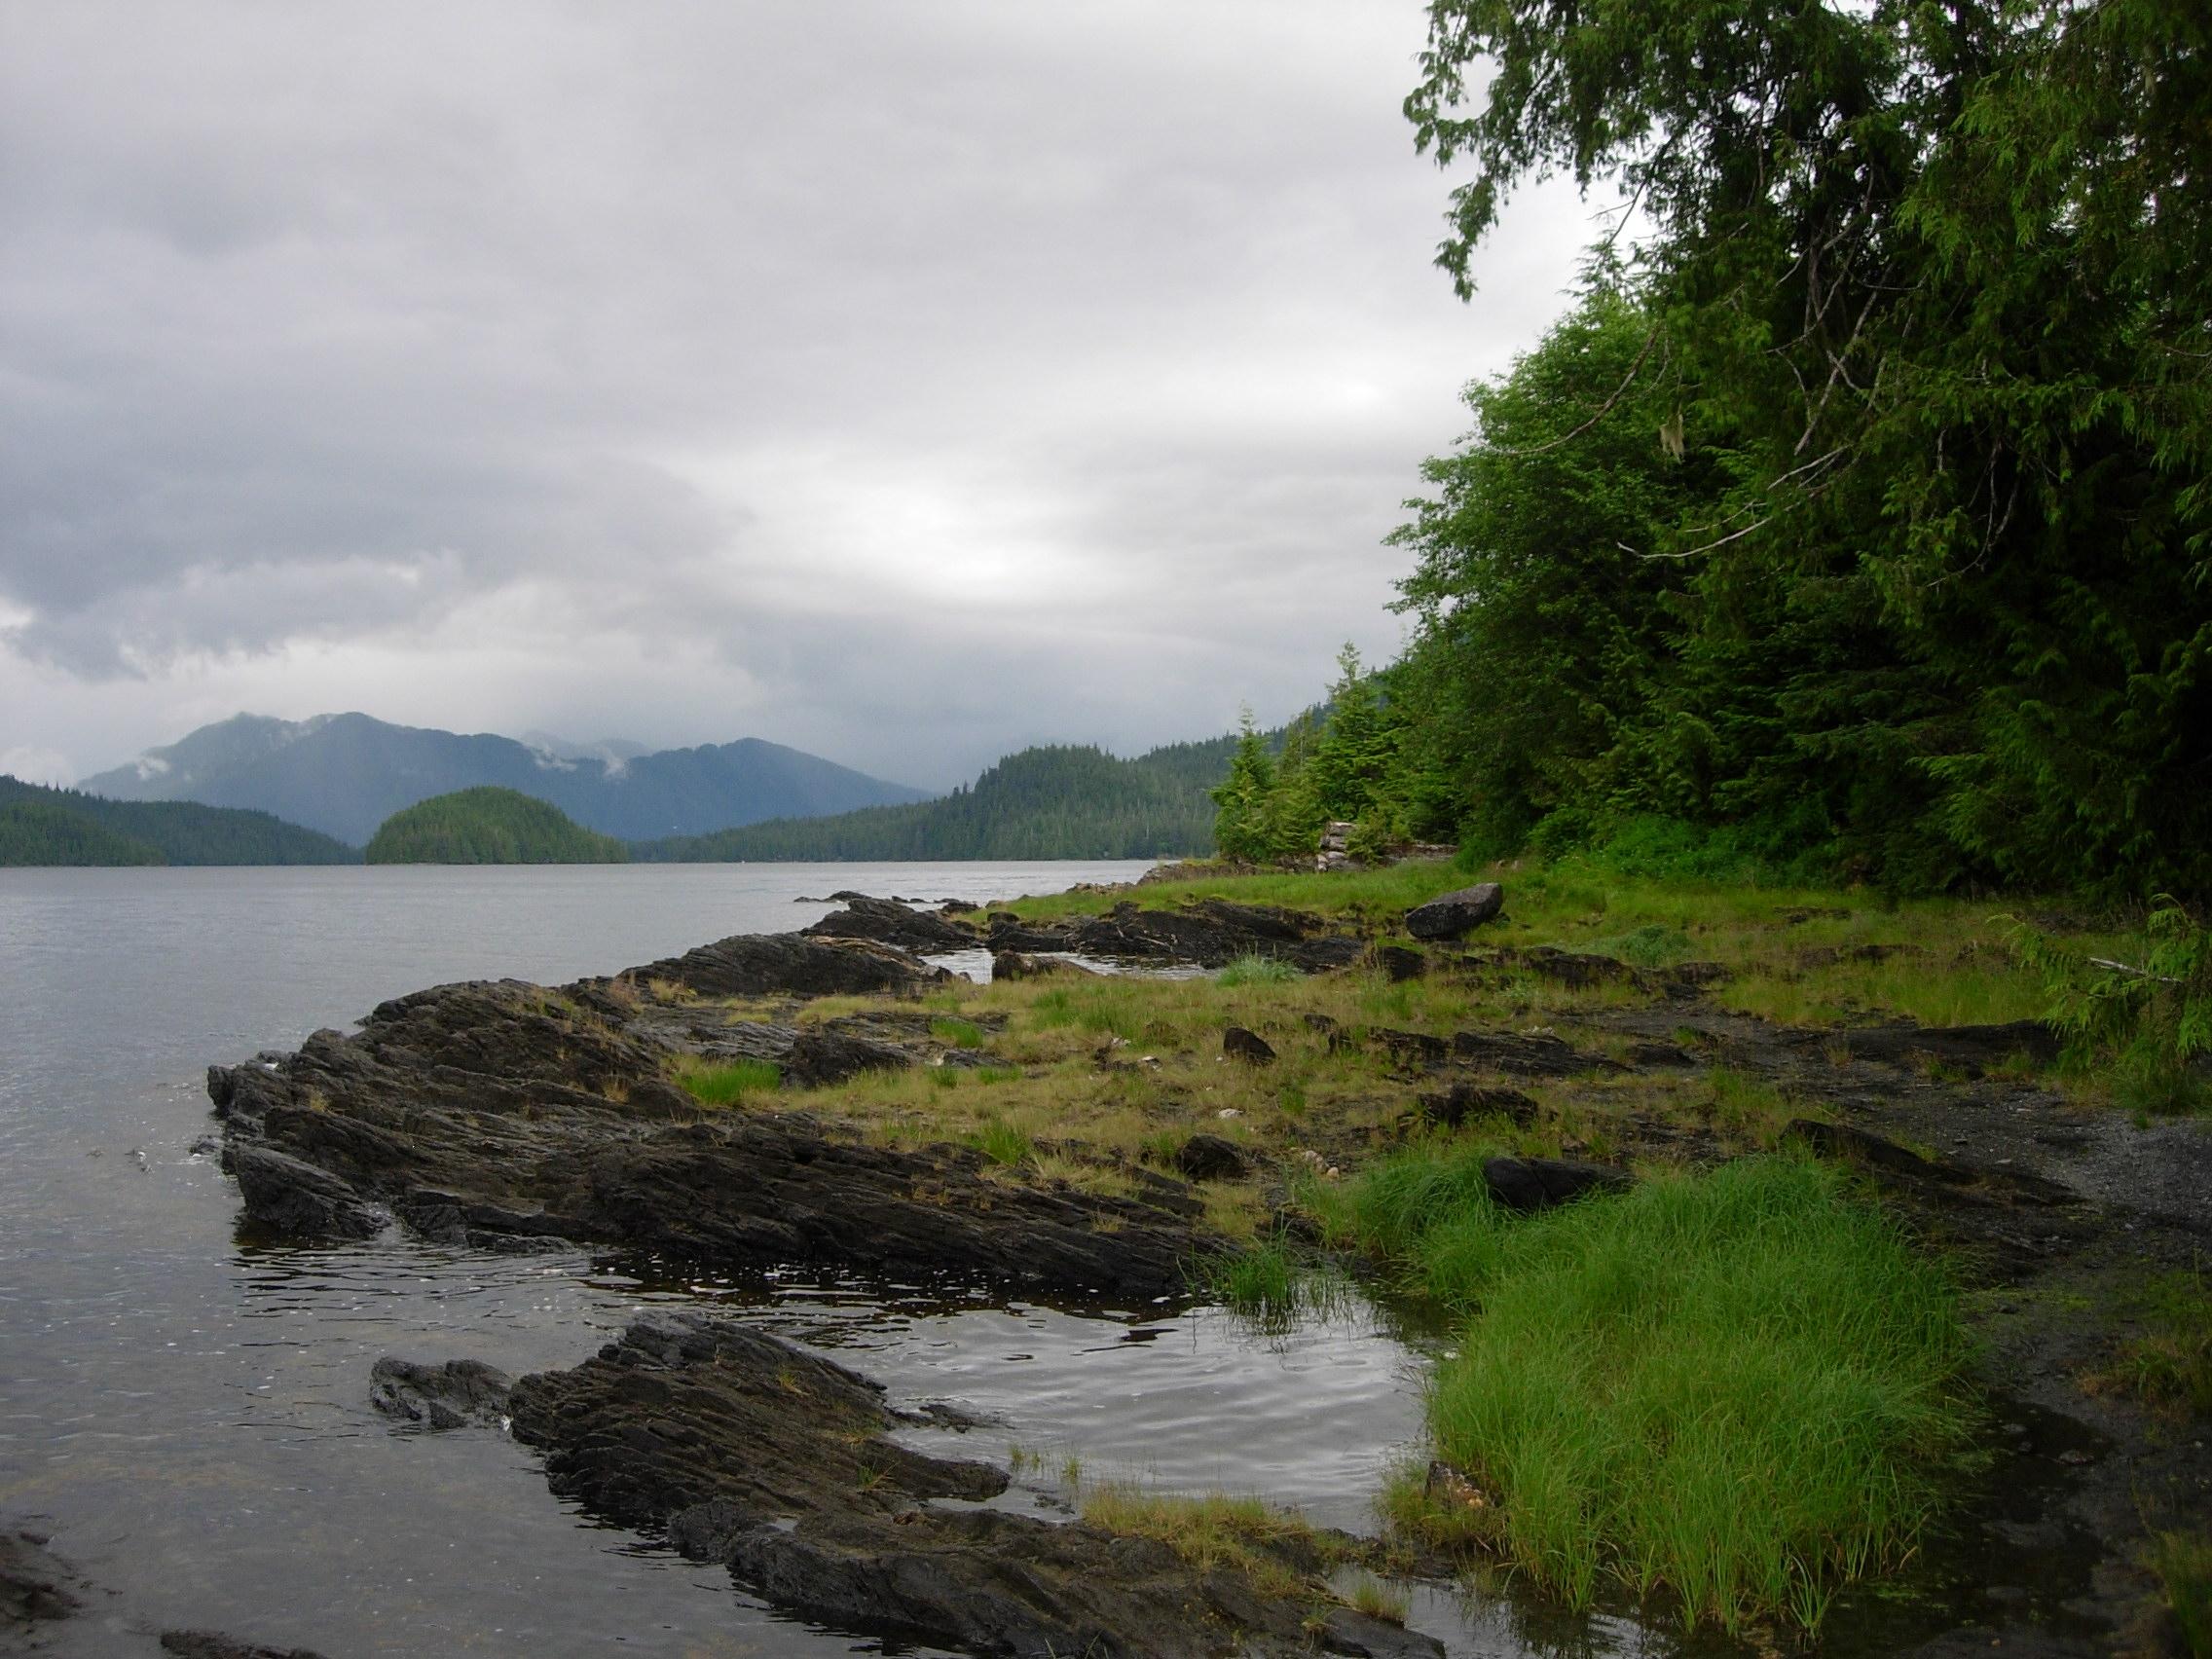 Tongass National Forest near Ketchikan, Alaska. (Creative Commons photo by Mark Brennan)